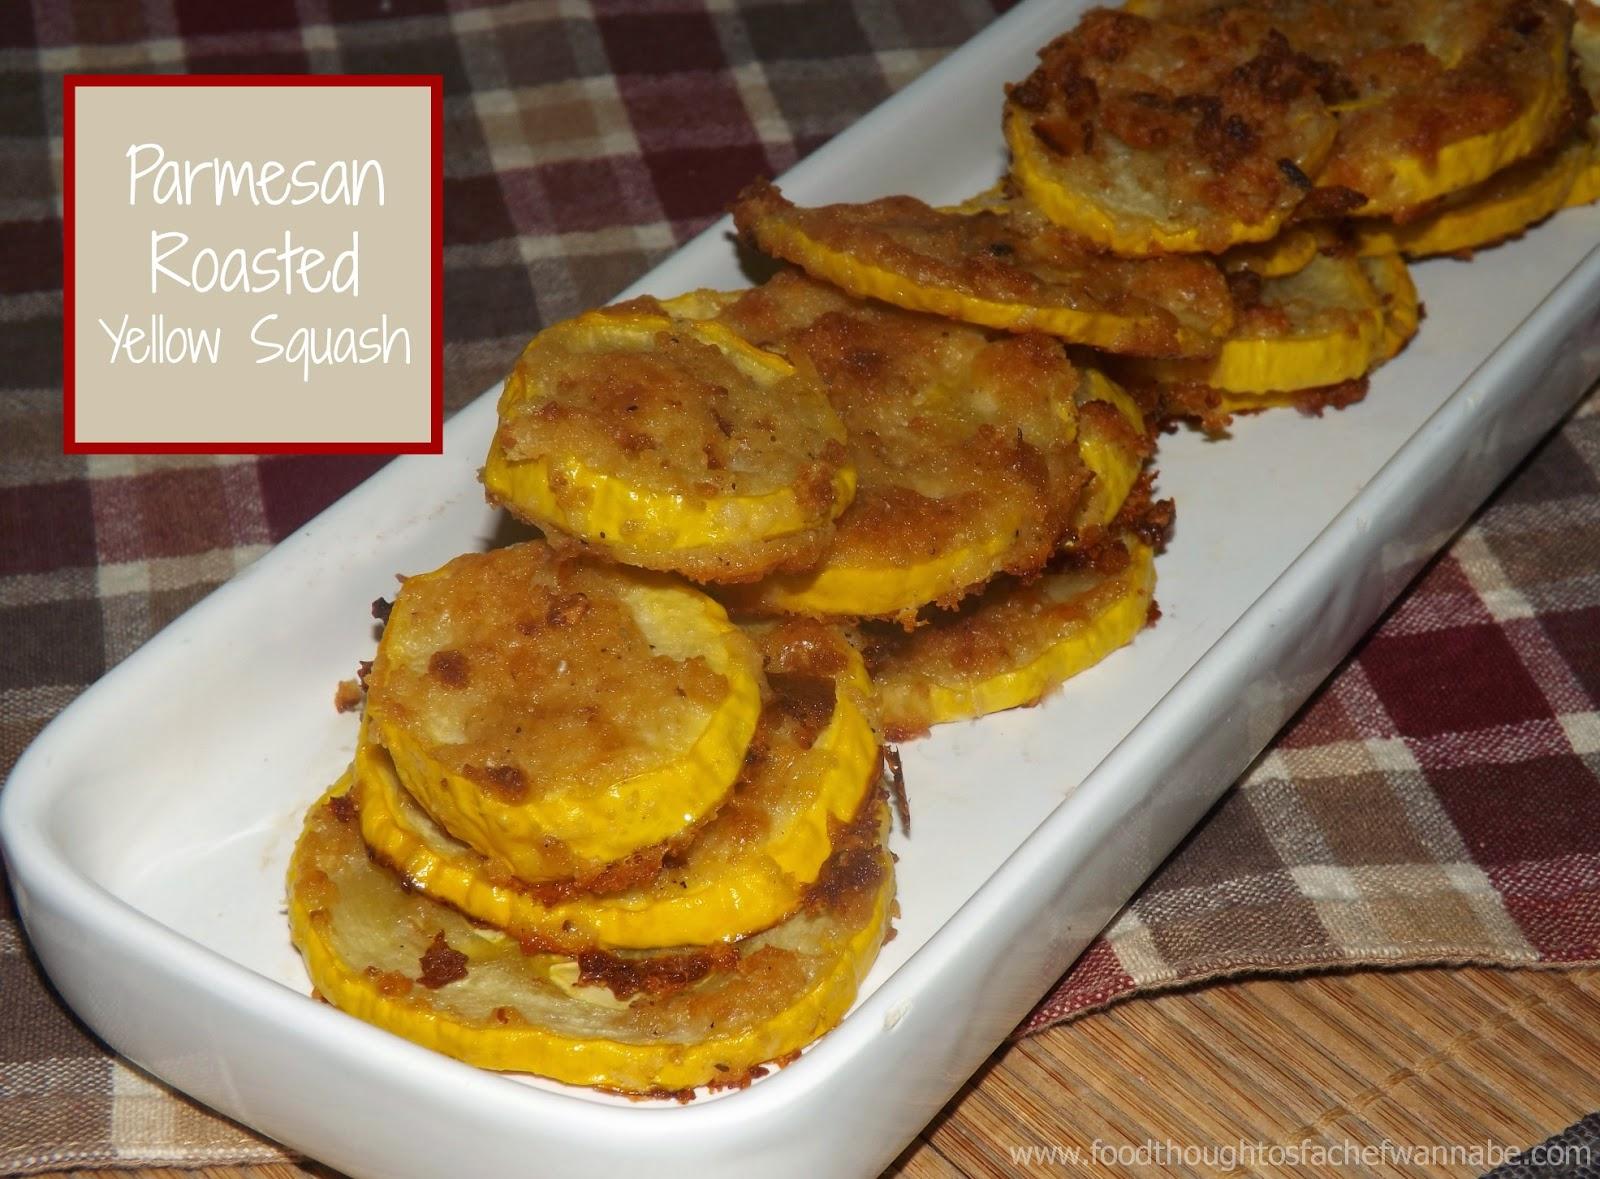 FoodThoughtsOfaChefWannabe: Parmesan Roasted Yellow Squash